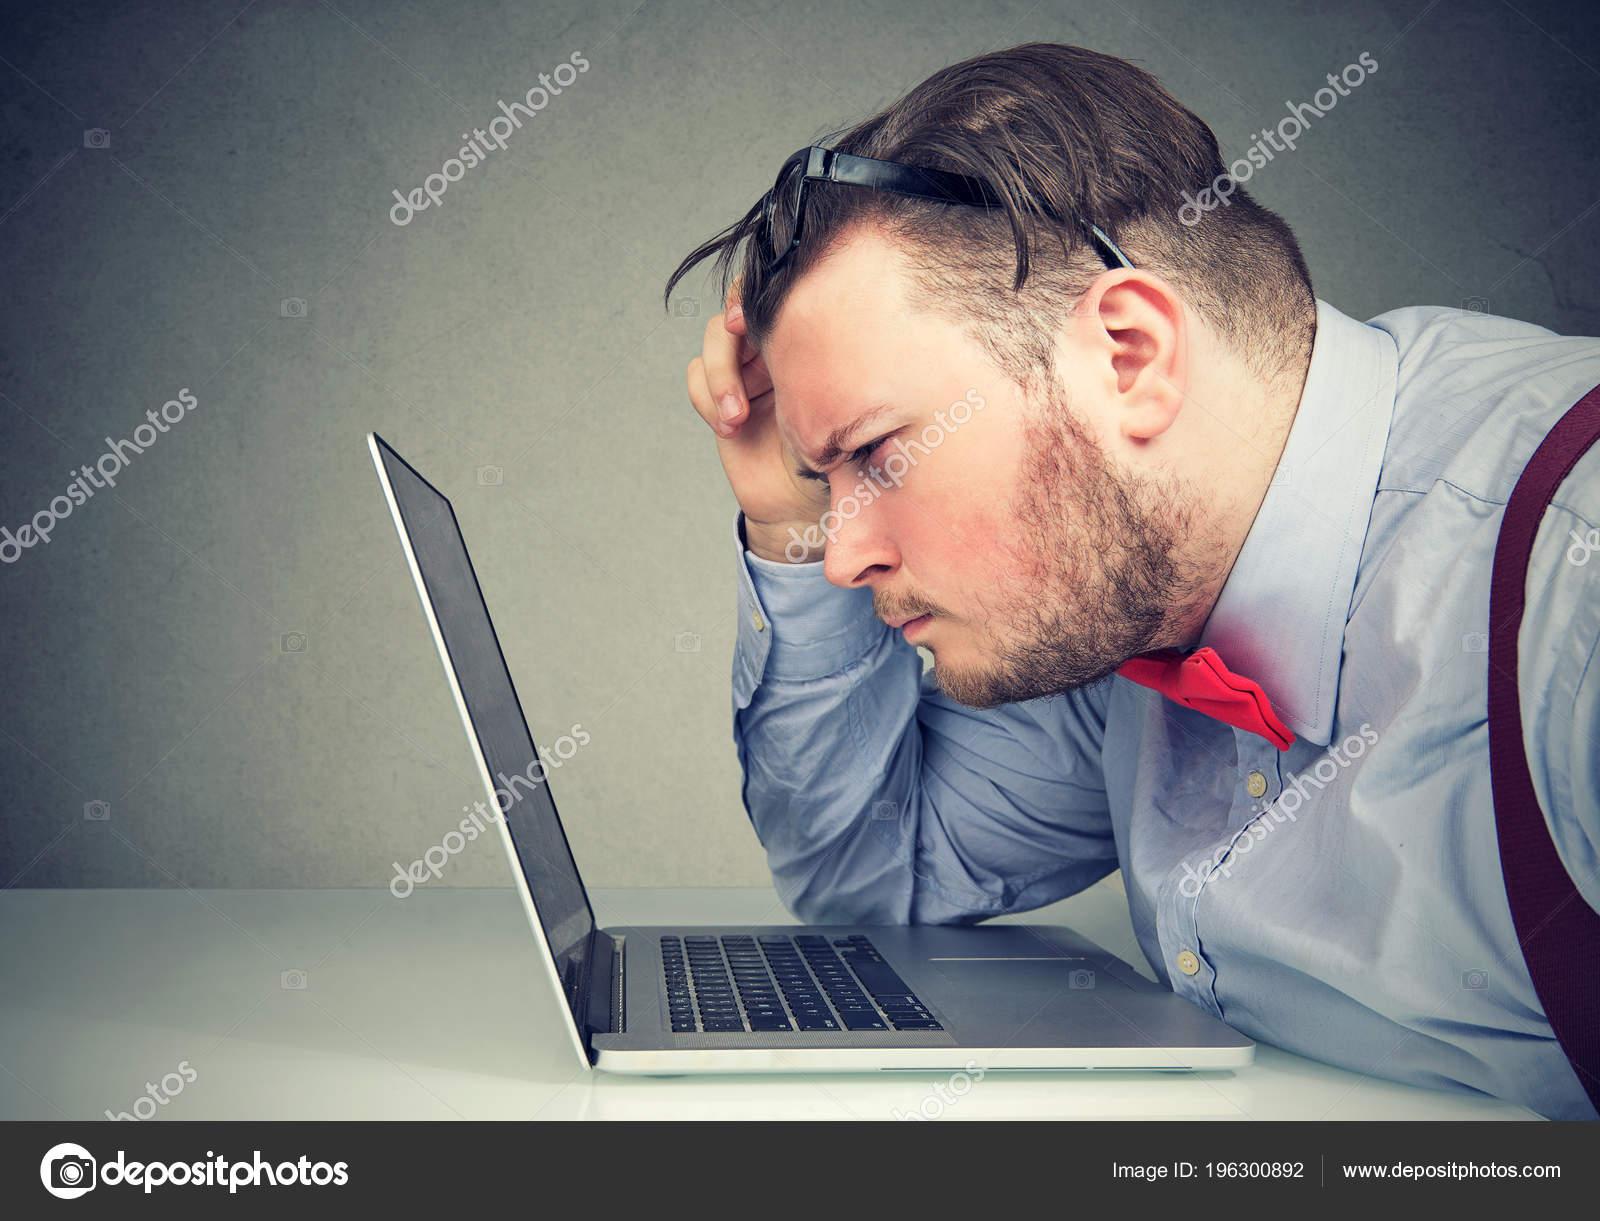 3cf77d1ad5 Closeup Επιχείρηση Άνθρωπος Βγάζοντας Γυαλιά Του Έχοντας Προβλήματα Όρασης  Είναι– εικόνα αρχείου